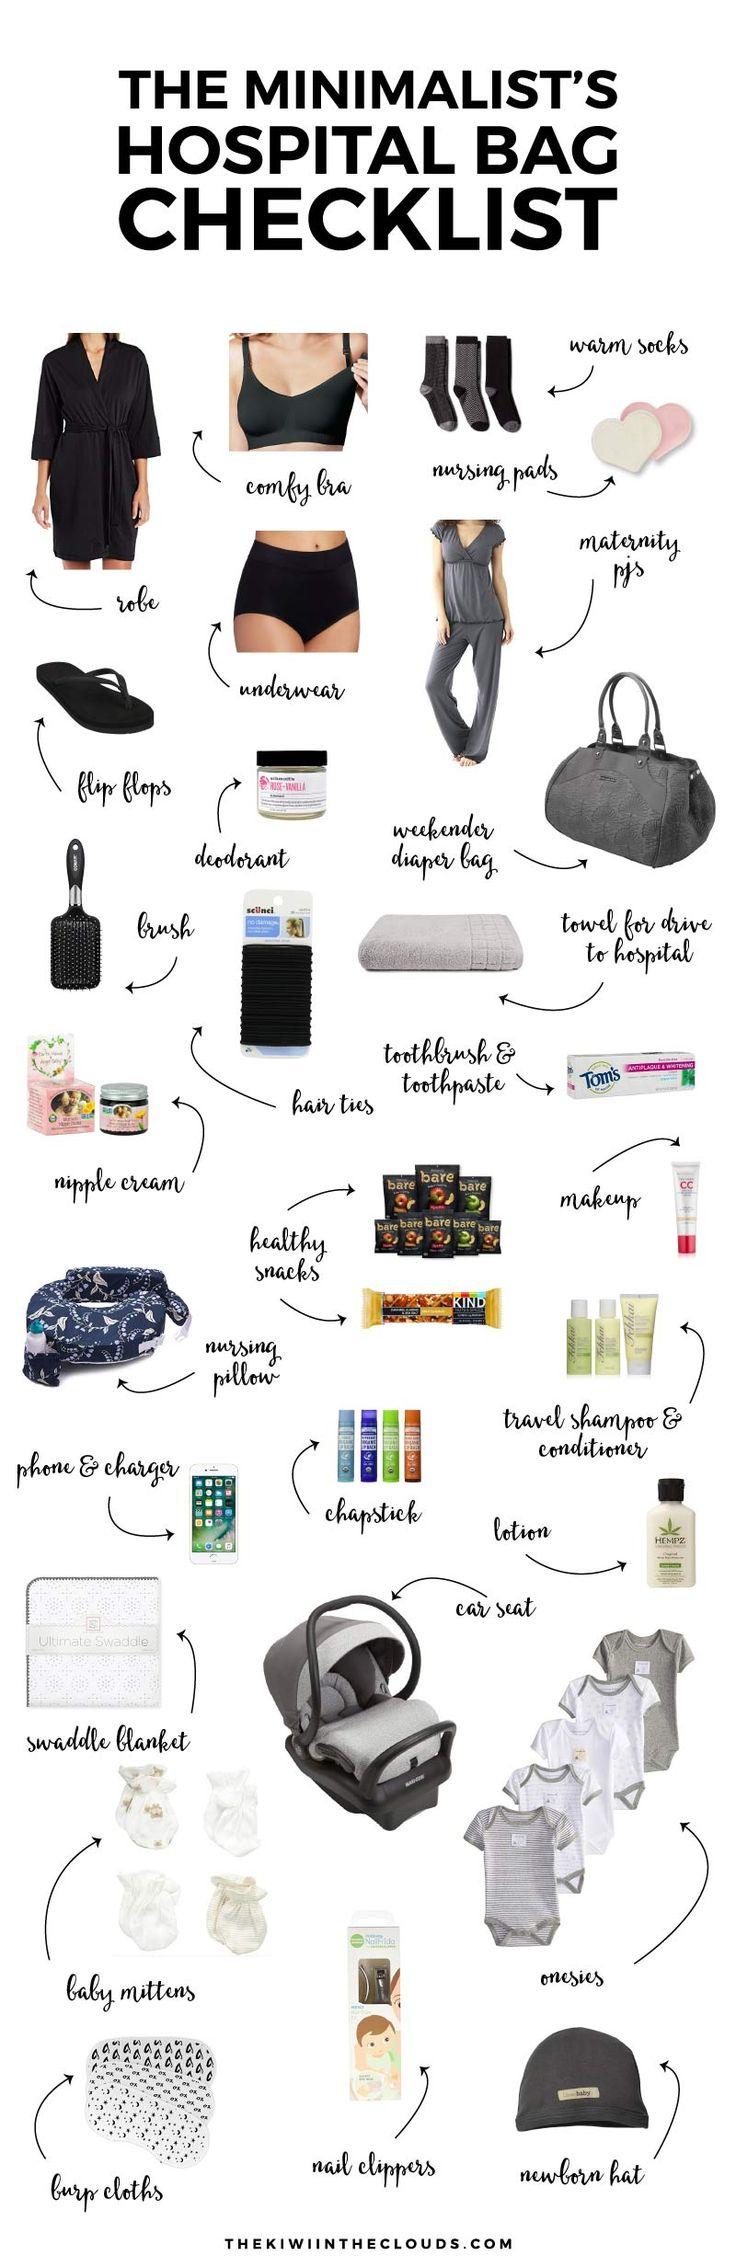 checklist for newborn